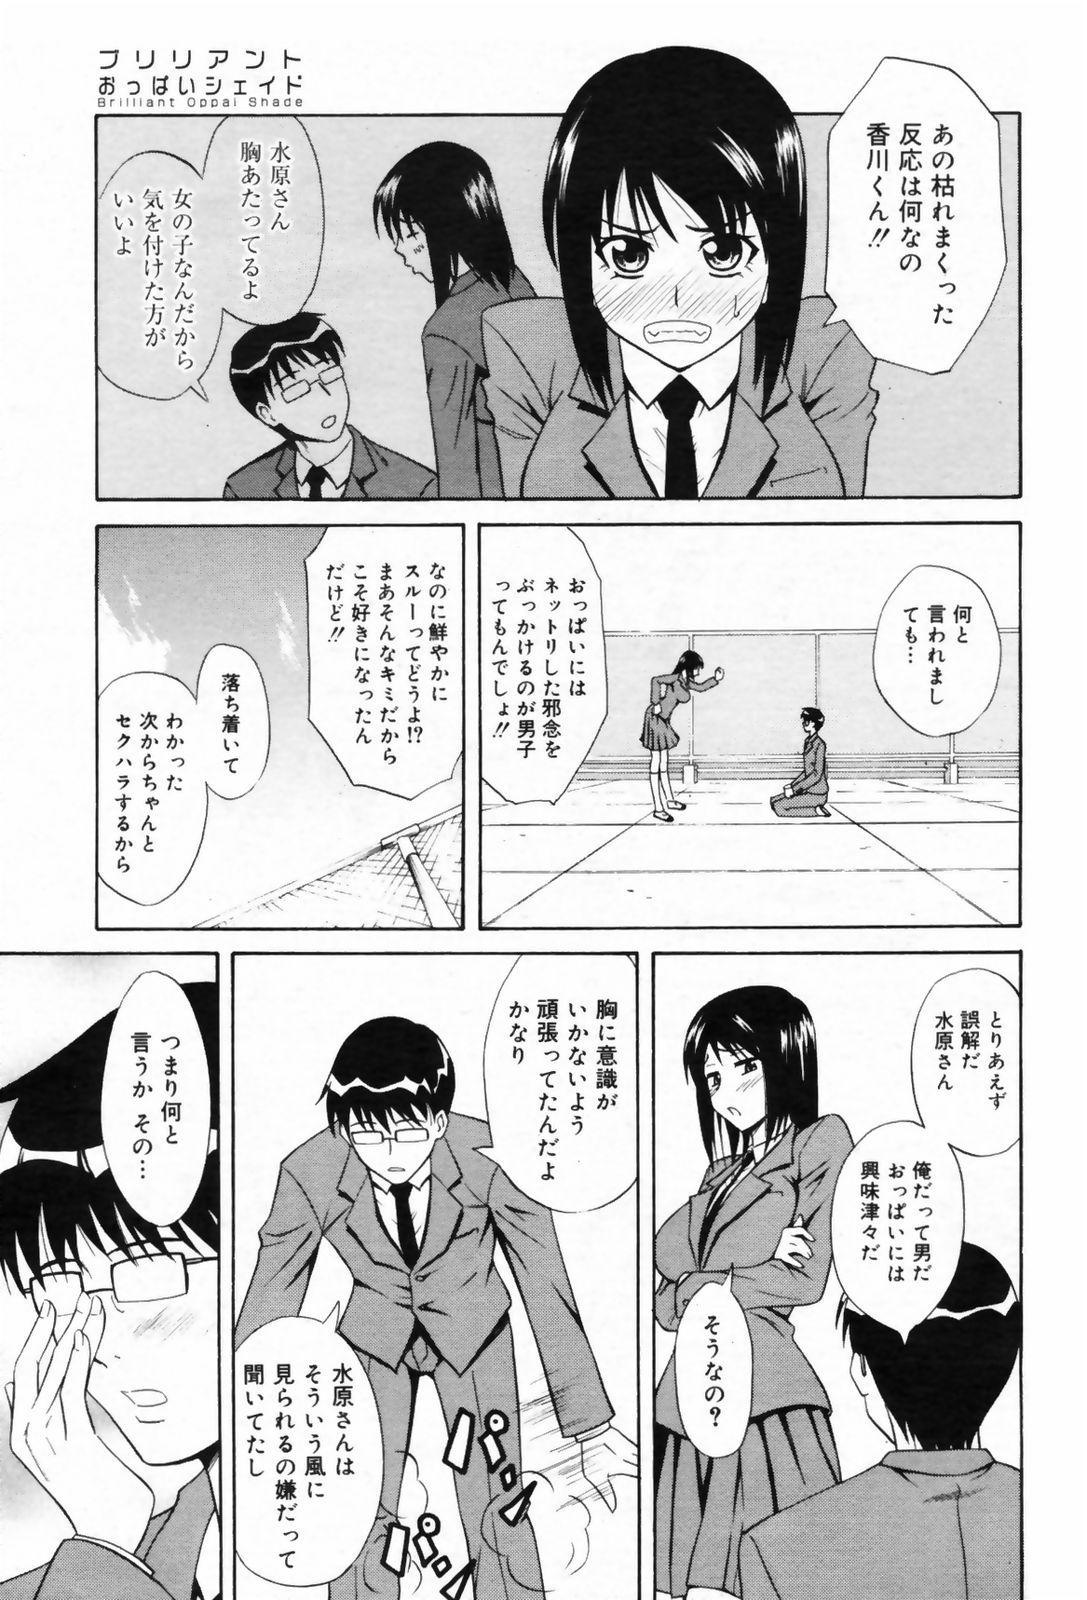 Manga Bangaichi 2009-02 Vol. 234 186